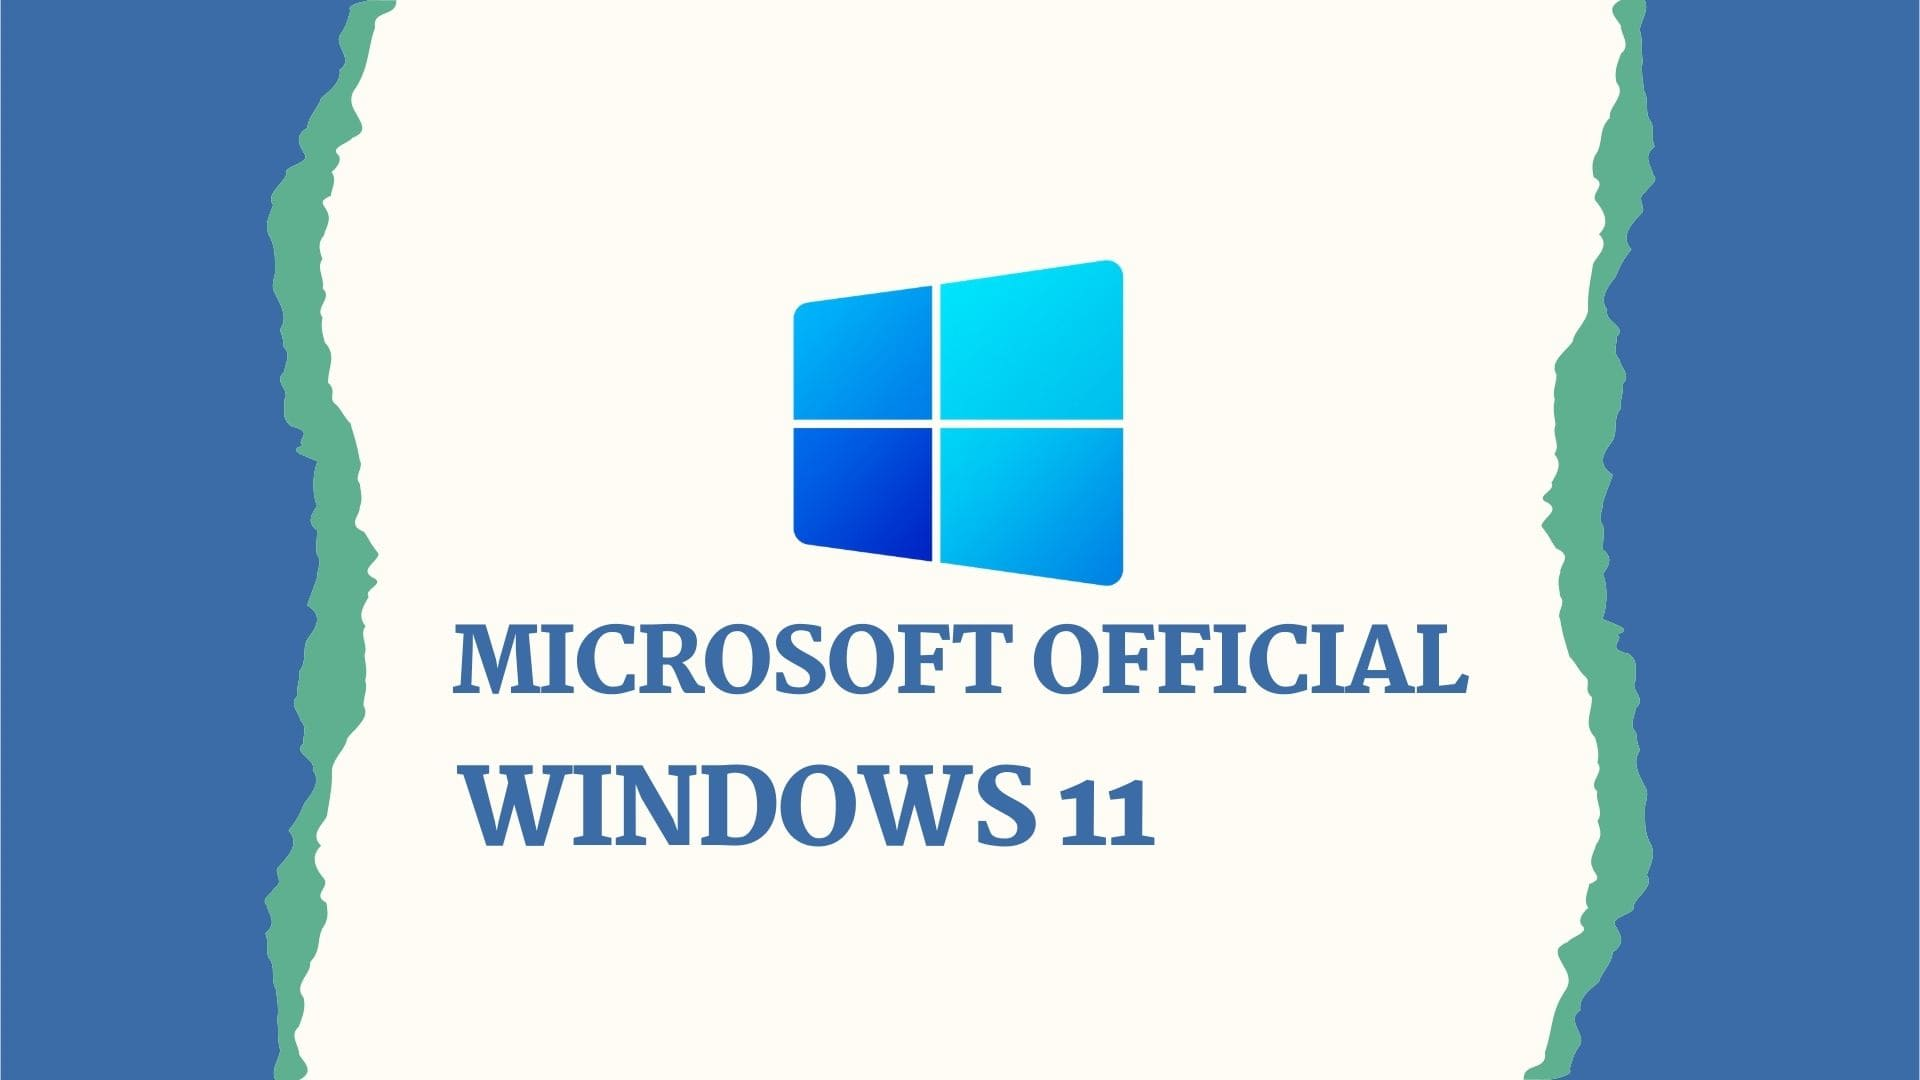 new windows in june 2021